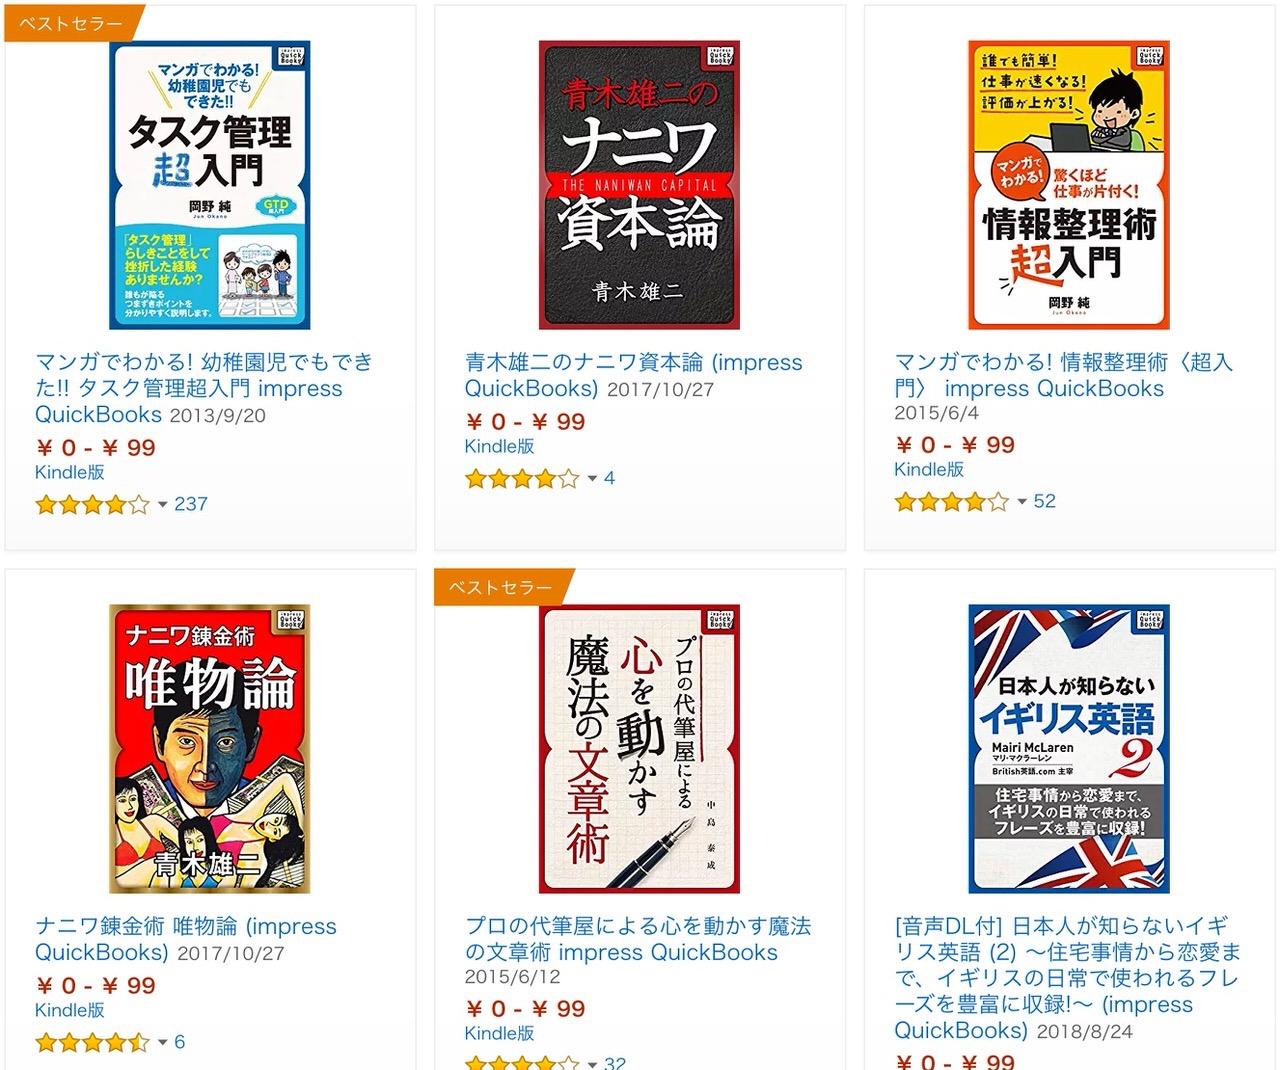 【Kindleセール】500冊以上が対象!99円「impress QuickBooksフェア」開催中(11/8まで)